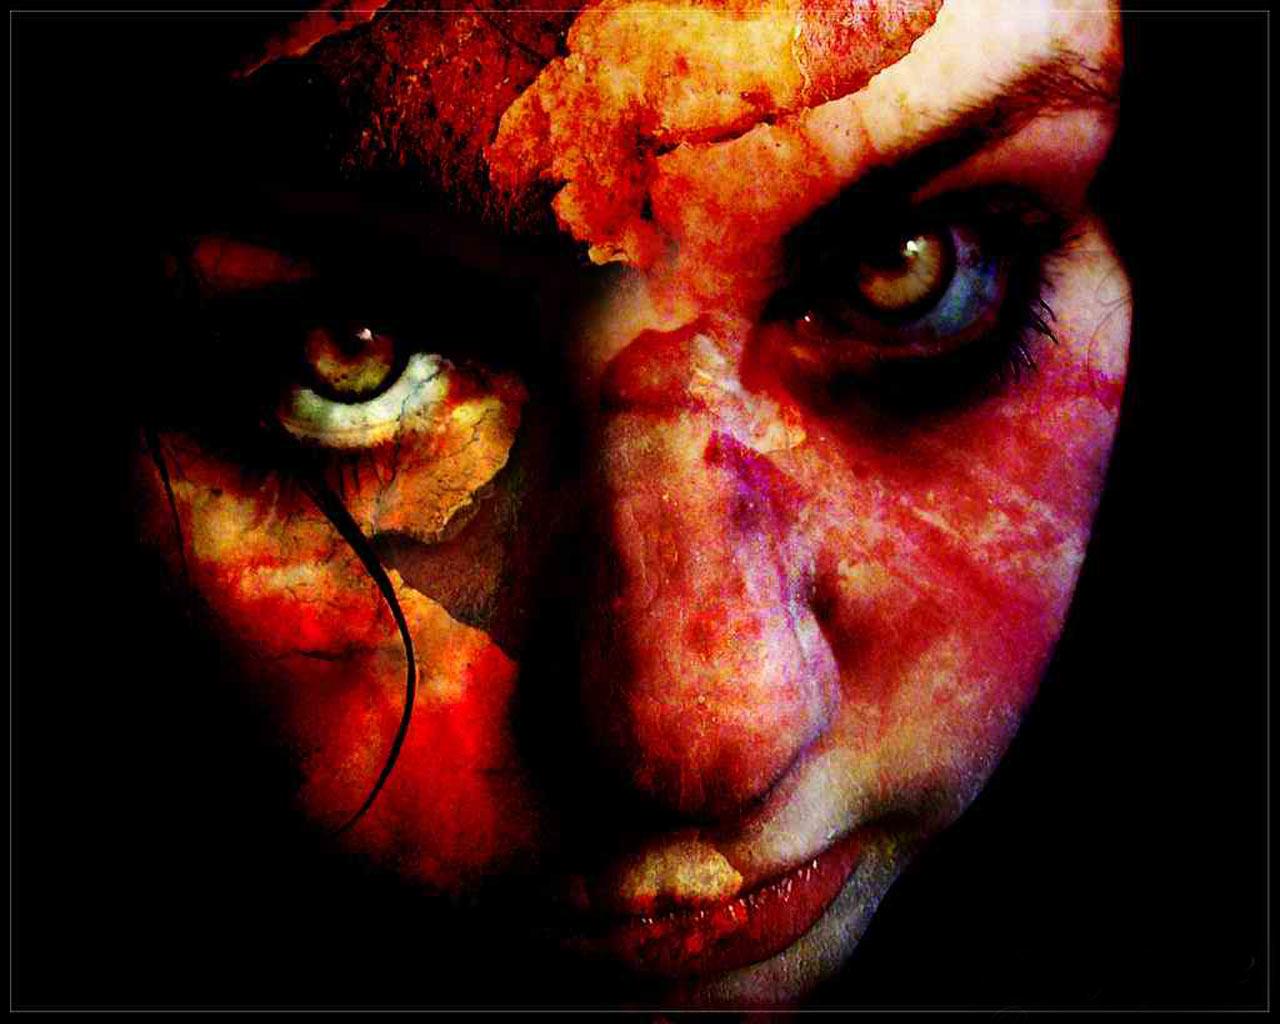 http://2.bp.blogspot.com/-TL4Dnm12tnQ/TZRtlV3WTHI/AAAAAAAAS9o/LVFV5JEaKYo/s1600/horror-face-painting-wallpaper%252B-%252BCopy.jpg